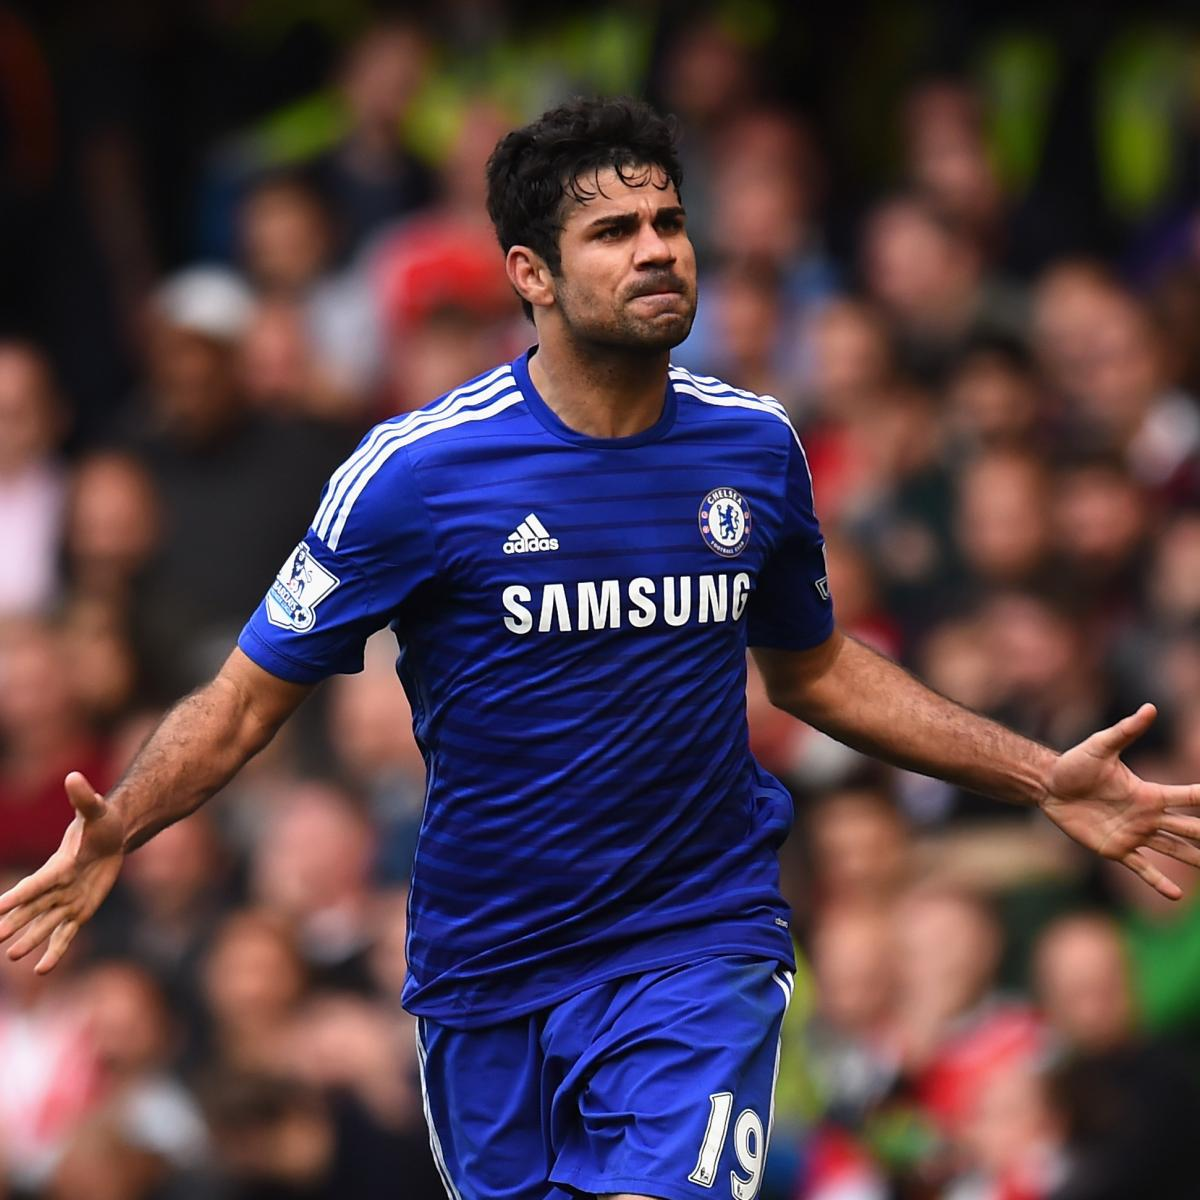 Psg Vs Manchester City Live Score Highlights From: Chelsea Vs. West Brom: Live Score, Highlights From Premier